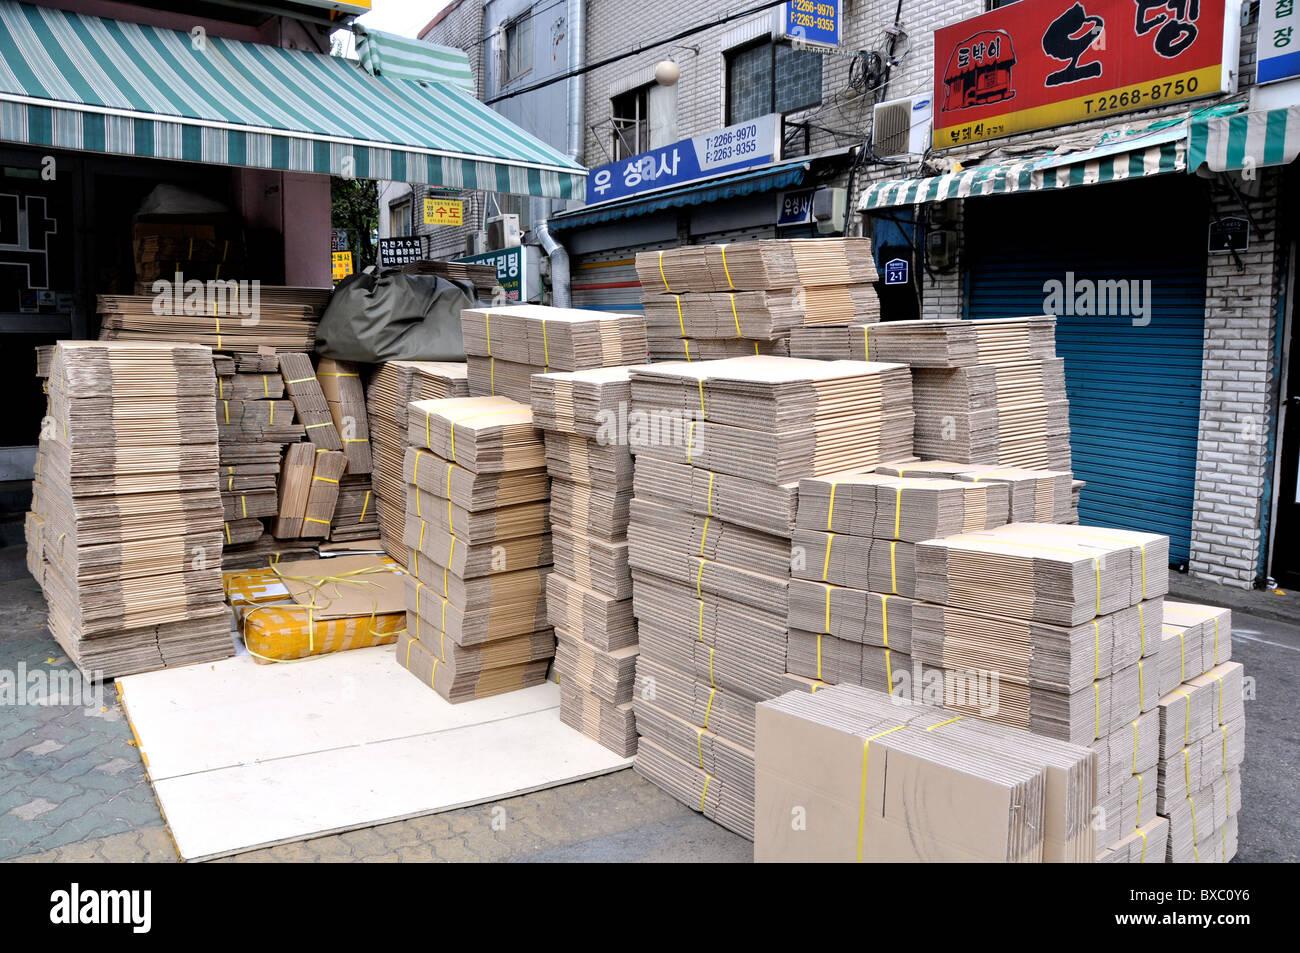 cardboard packaging in street Seoul, South Korea - Stock Image